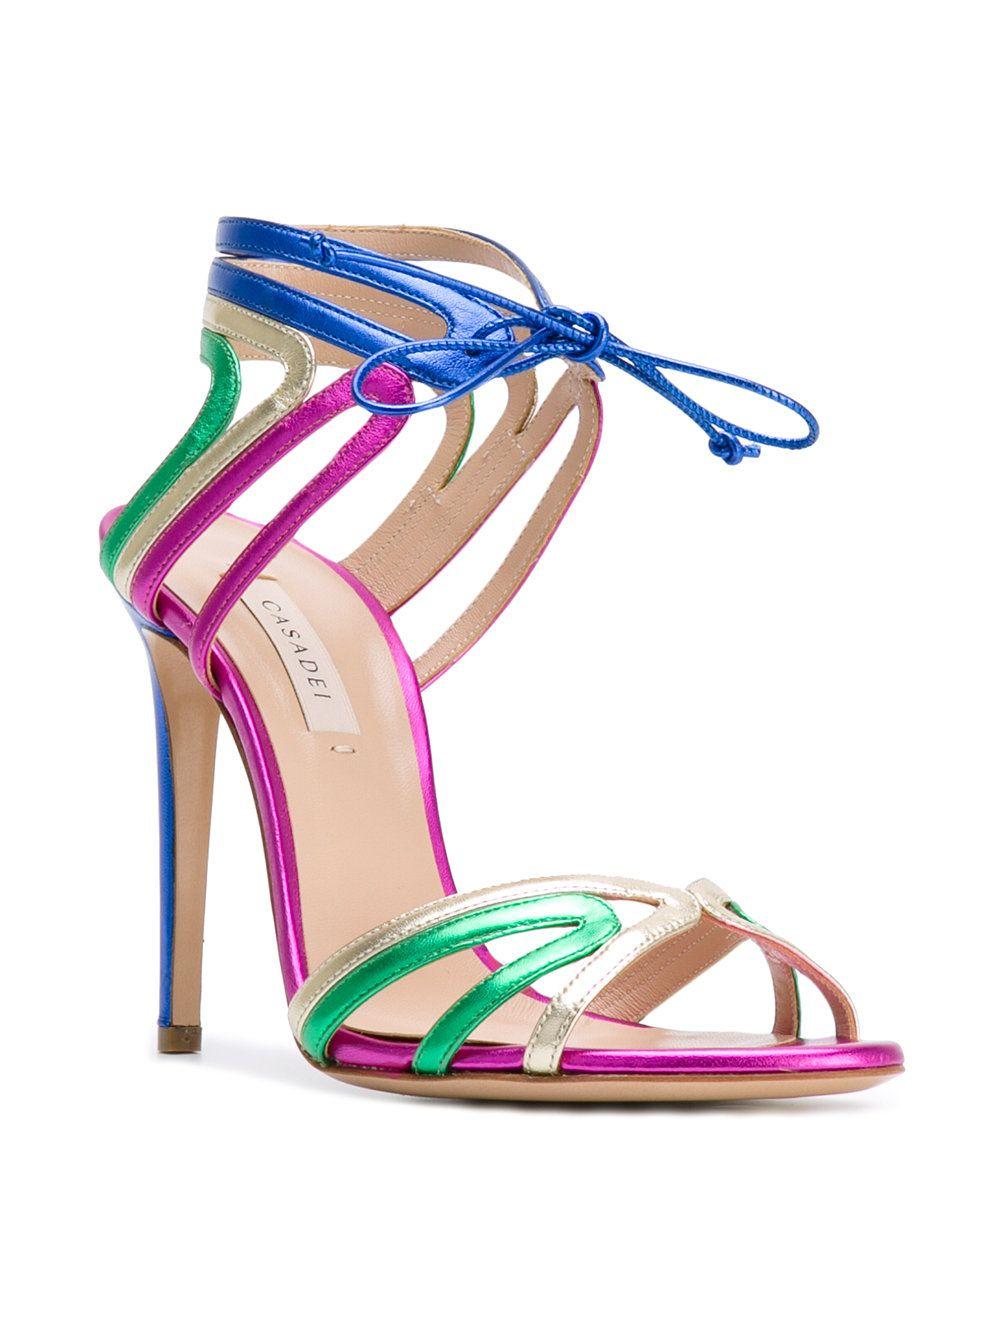 3b09aa2042b CASADEI stiletto heel sandals | Shoe obsession | Sandals, Stiletto ...